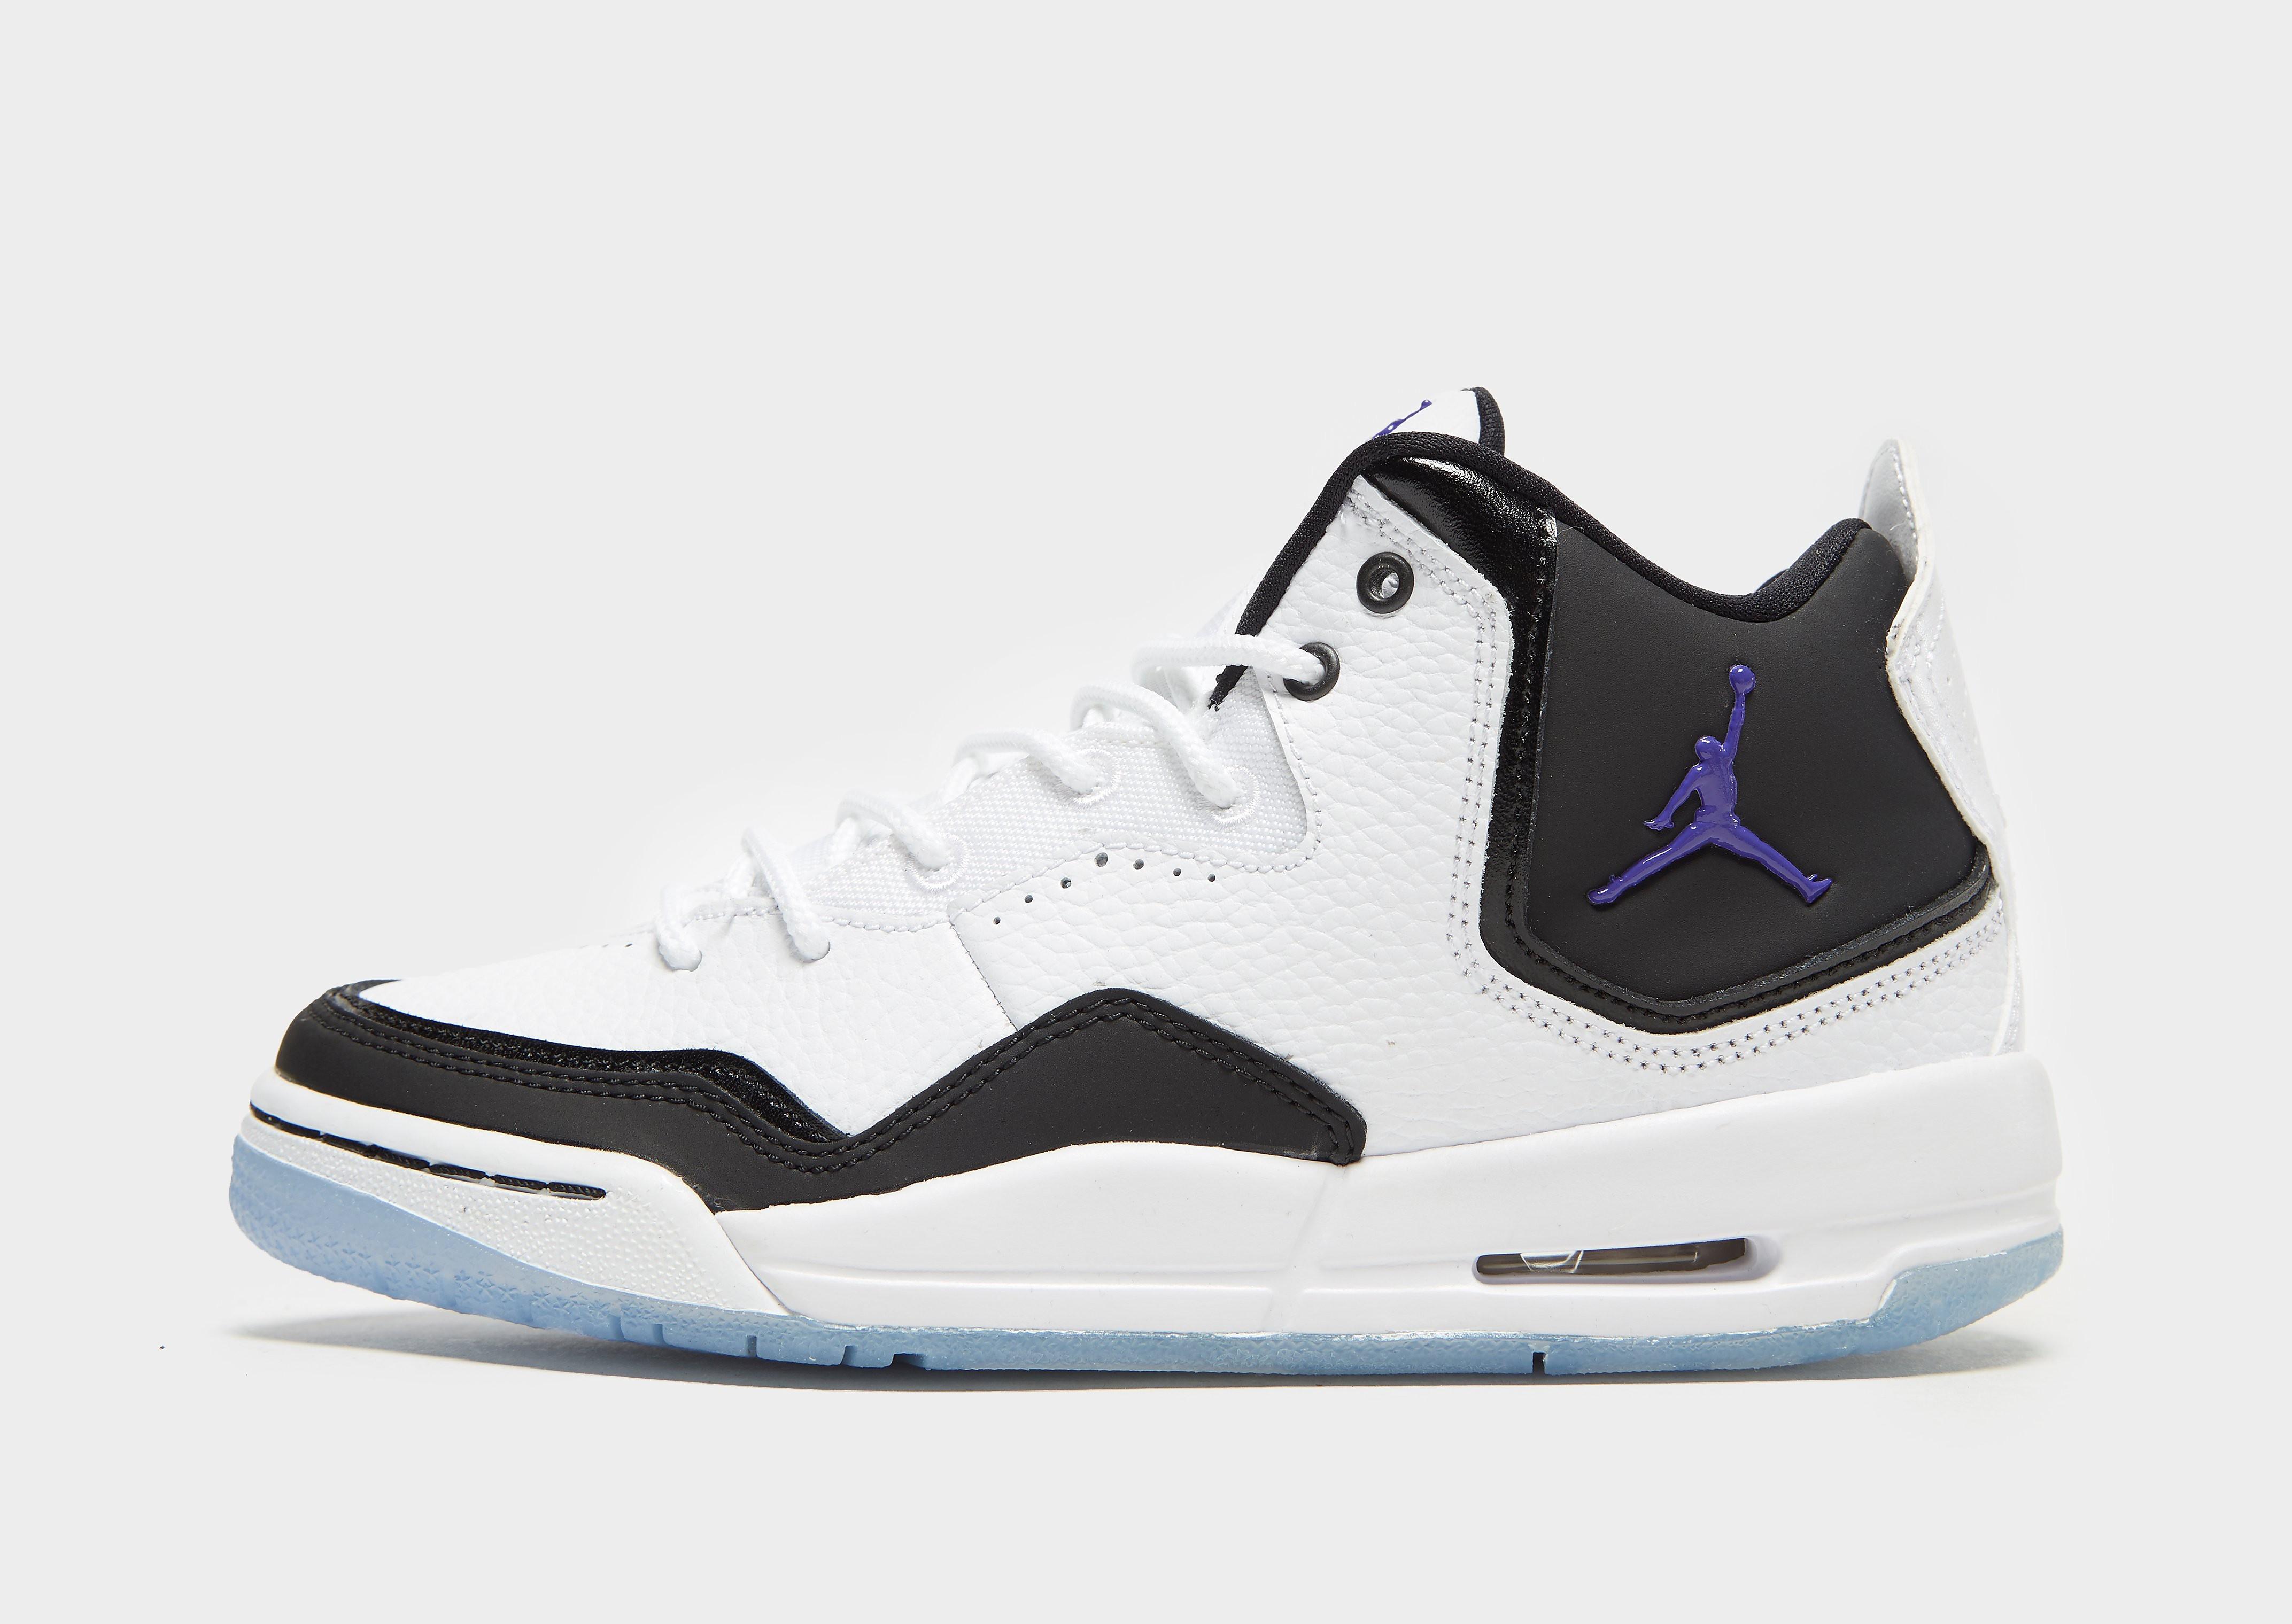 Jordan kindersneaker wit, zwart en paars